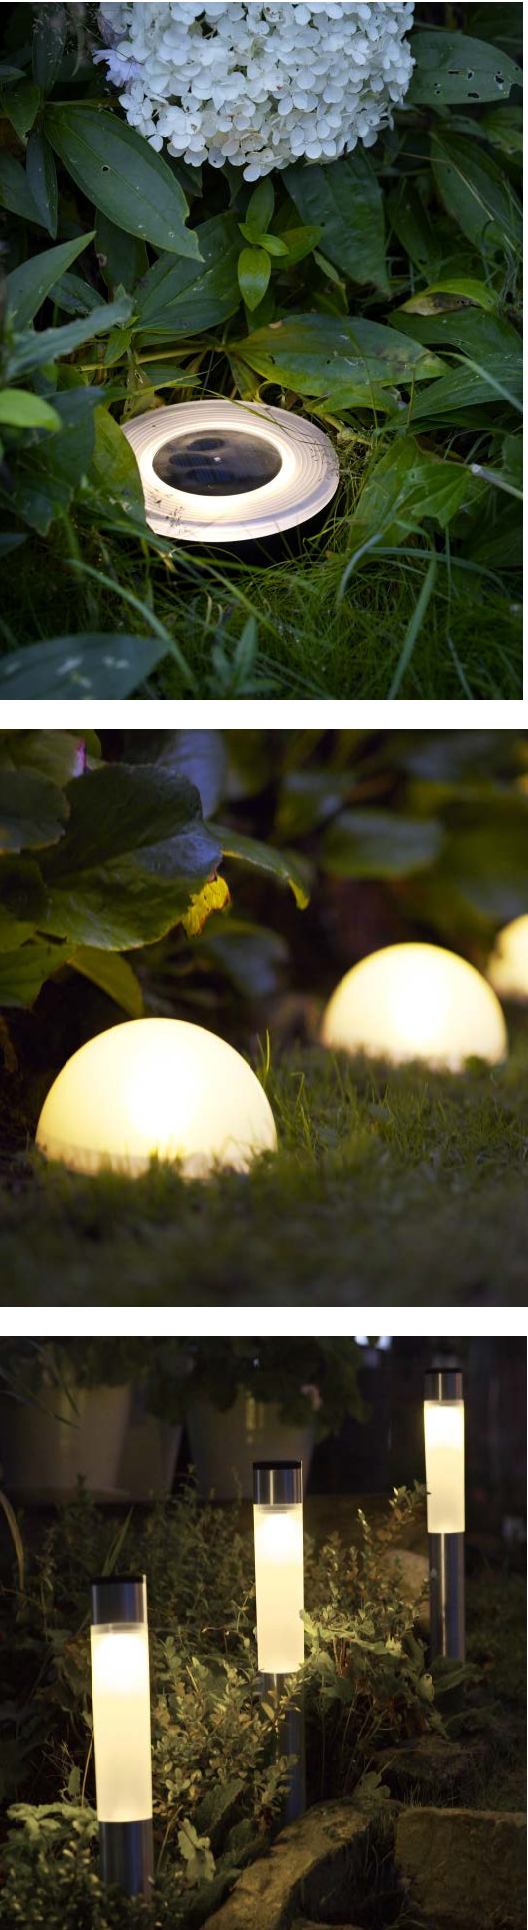 Light The Way With Solvinden Solar Powered Lights Perfect For Your Yard And Pathways Jardines Iluminacion Jardin Lampara De Jardin